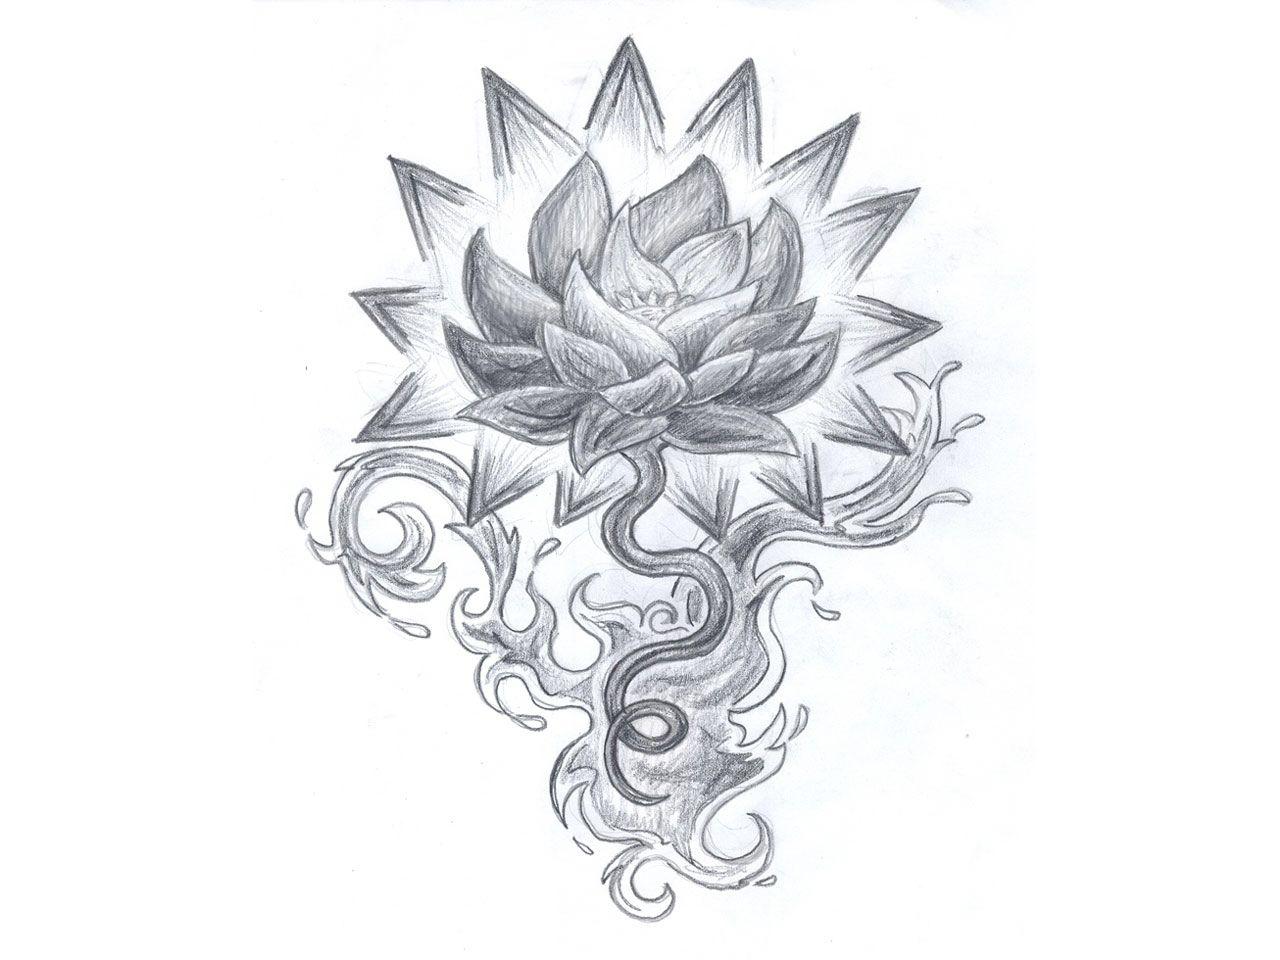 Image From Httplunaregameztattoodesignslotus Flower